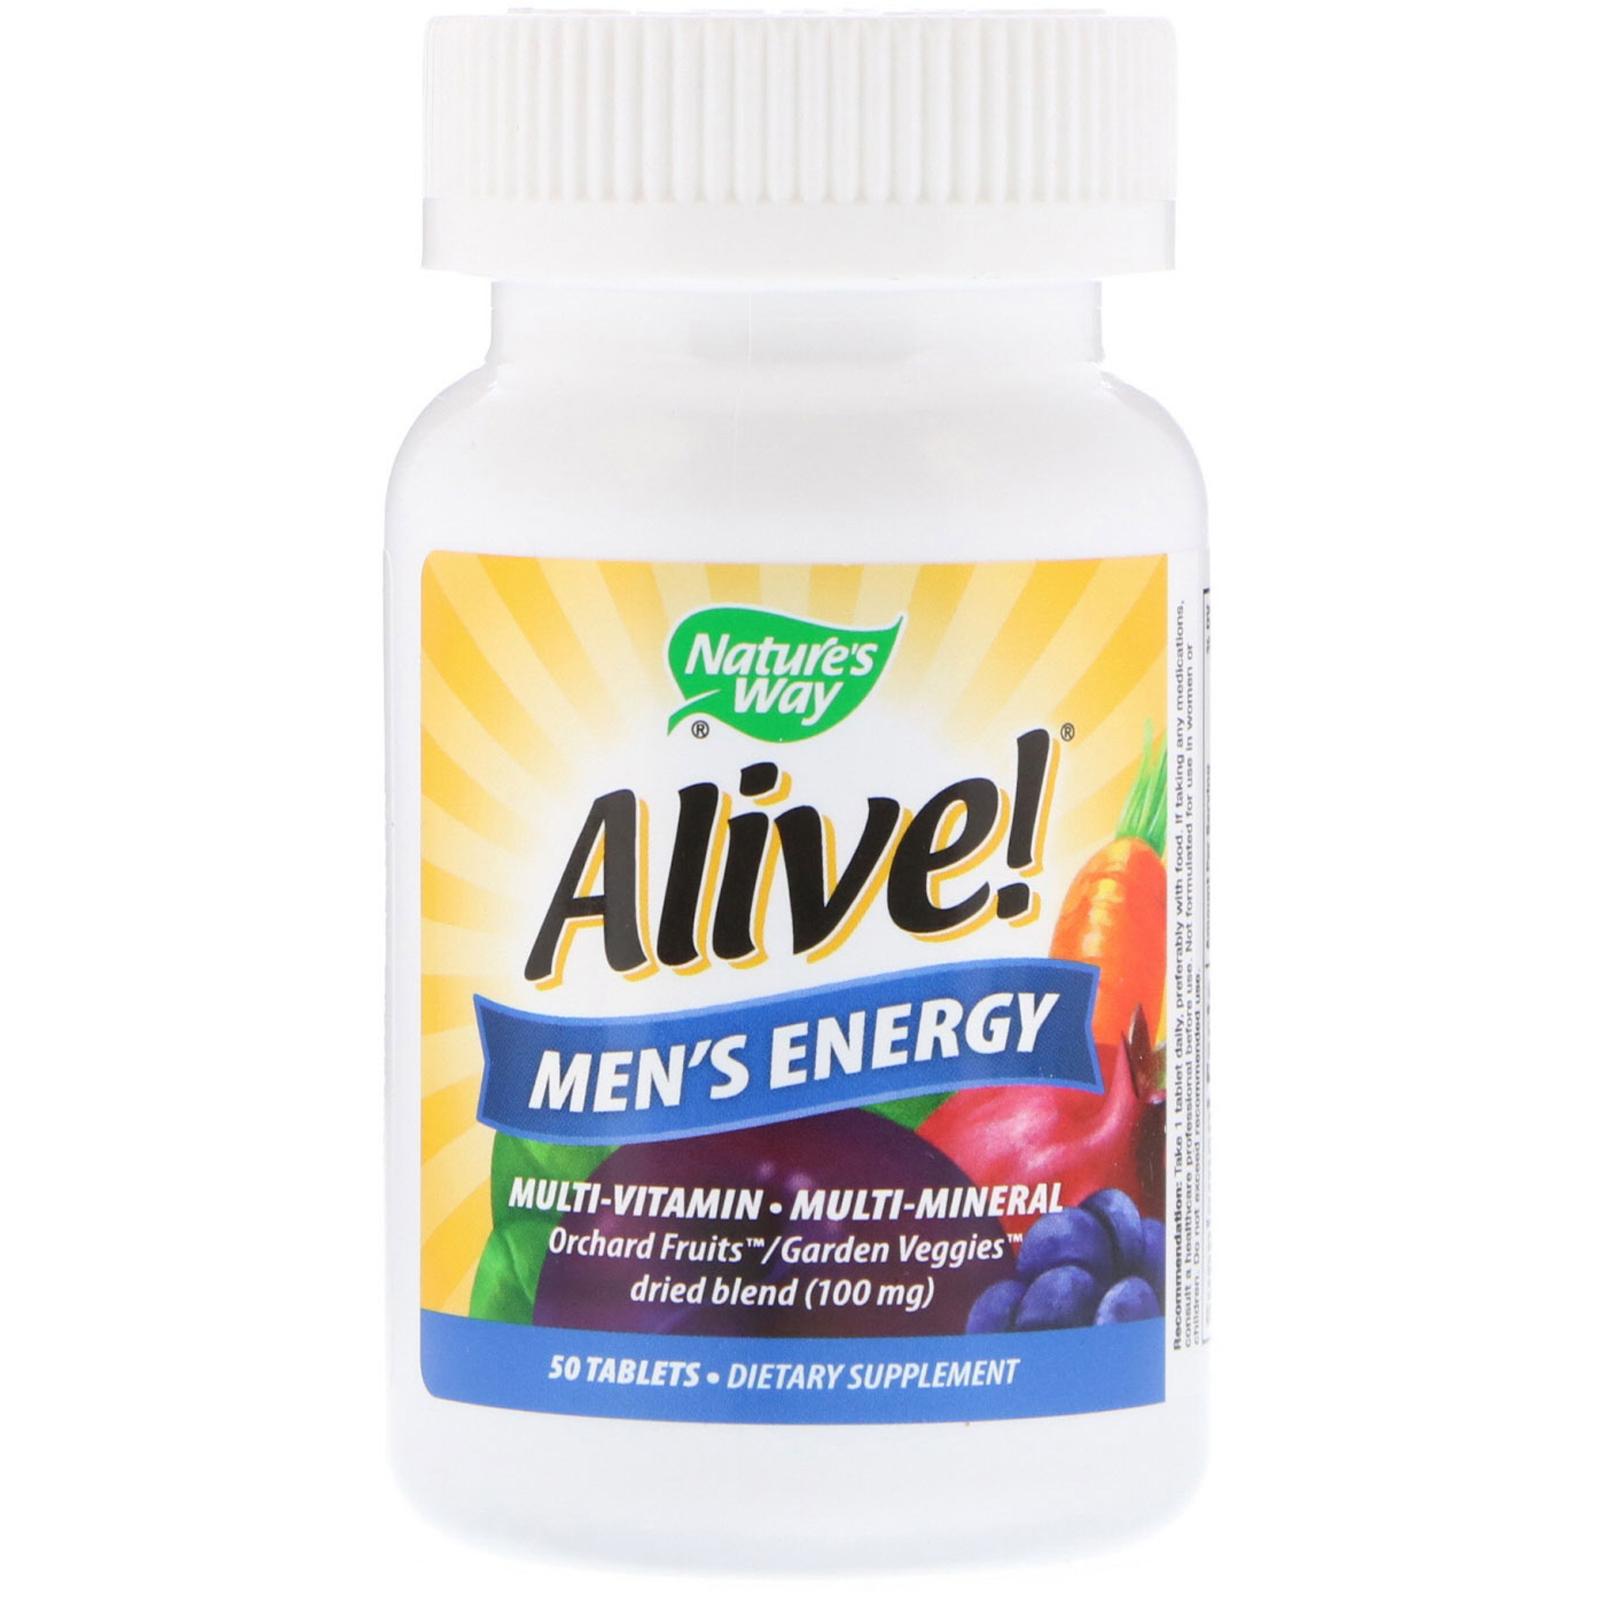 Nature's Way, Alive!, Men's Energy Multivitamin-Multimineral, 50